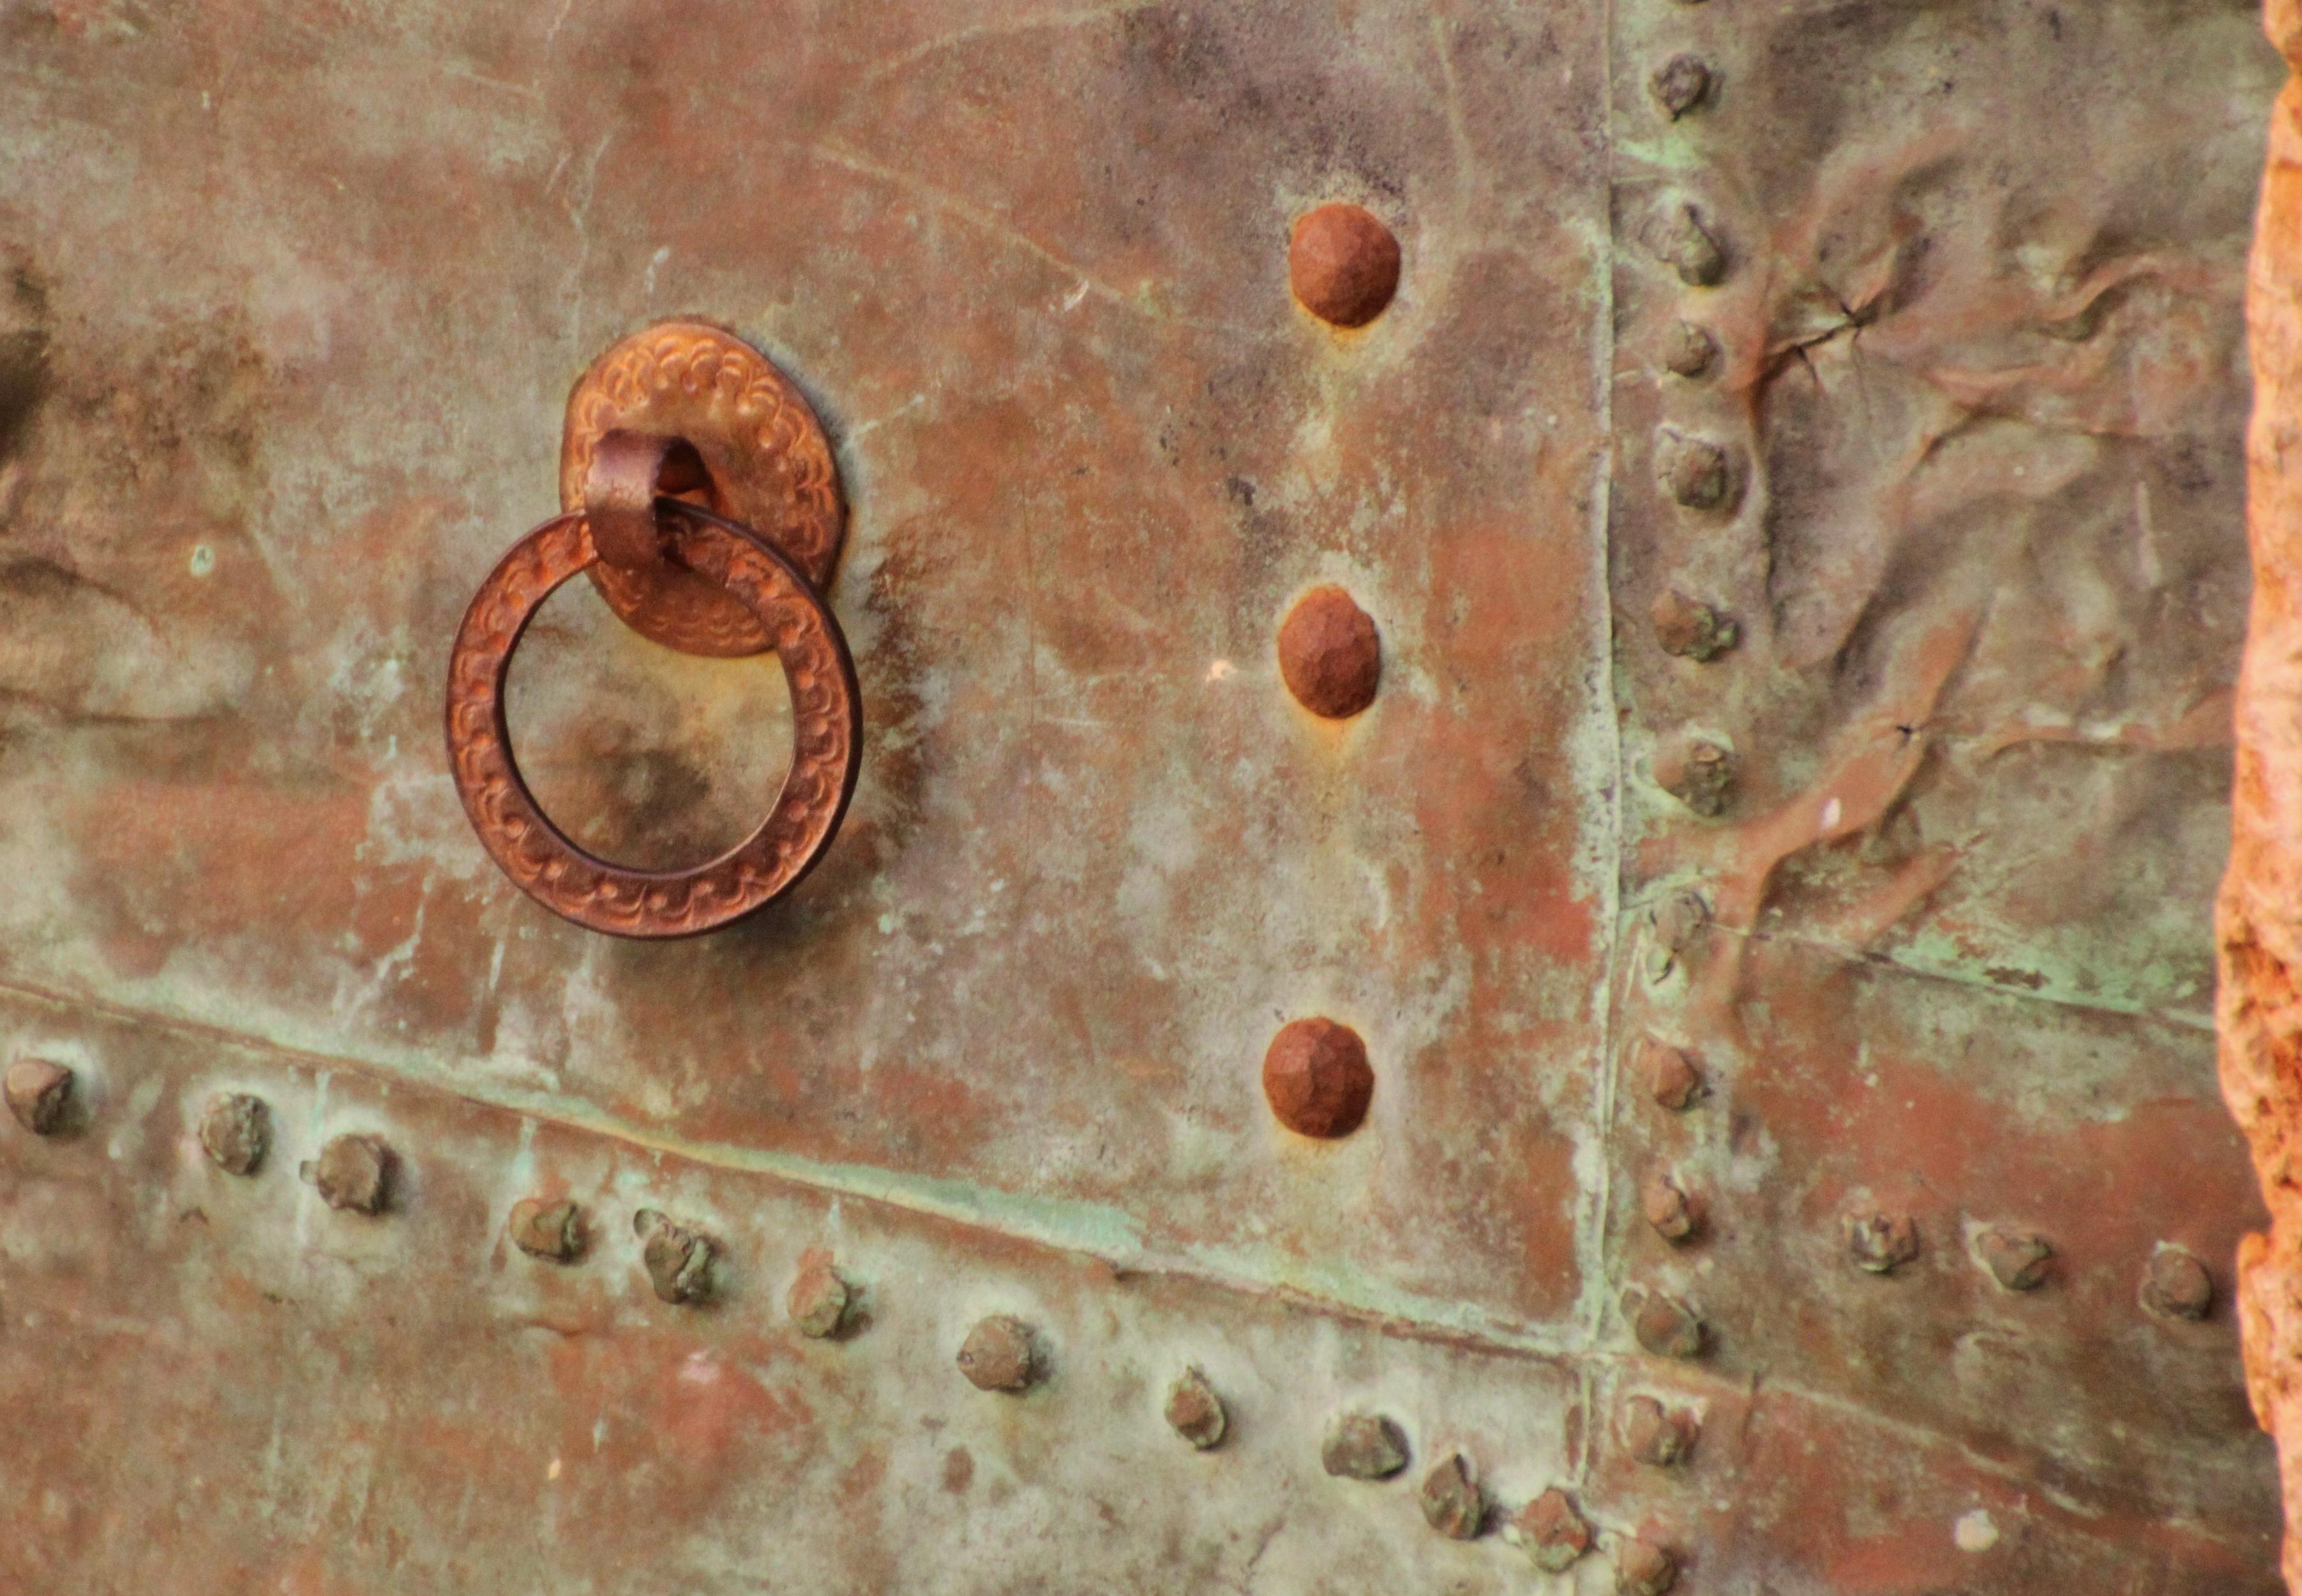 Metal, Rust, Exit, Entrance, Door, HQ Photo